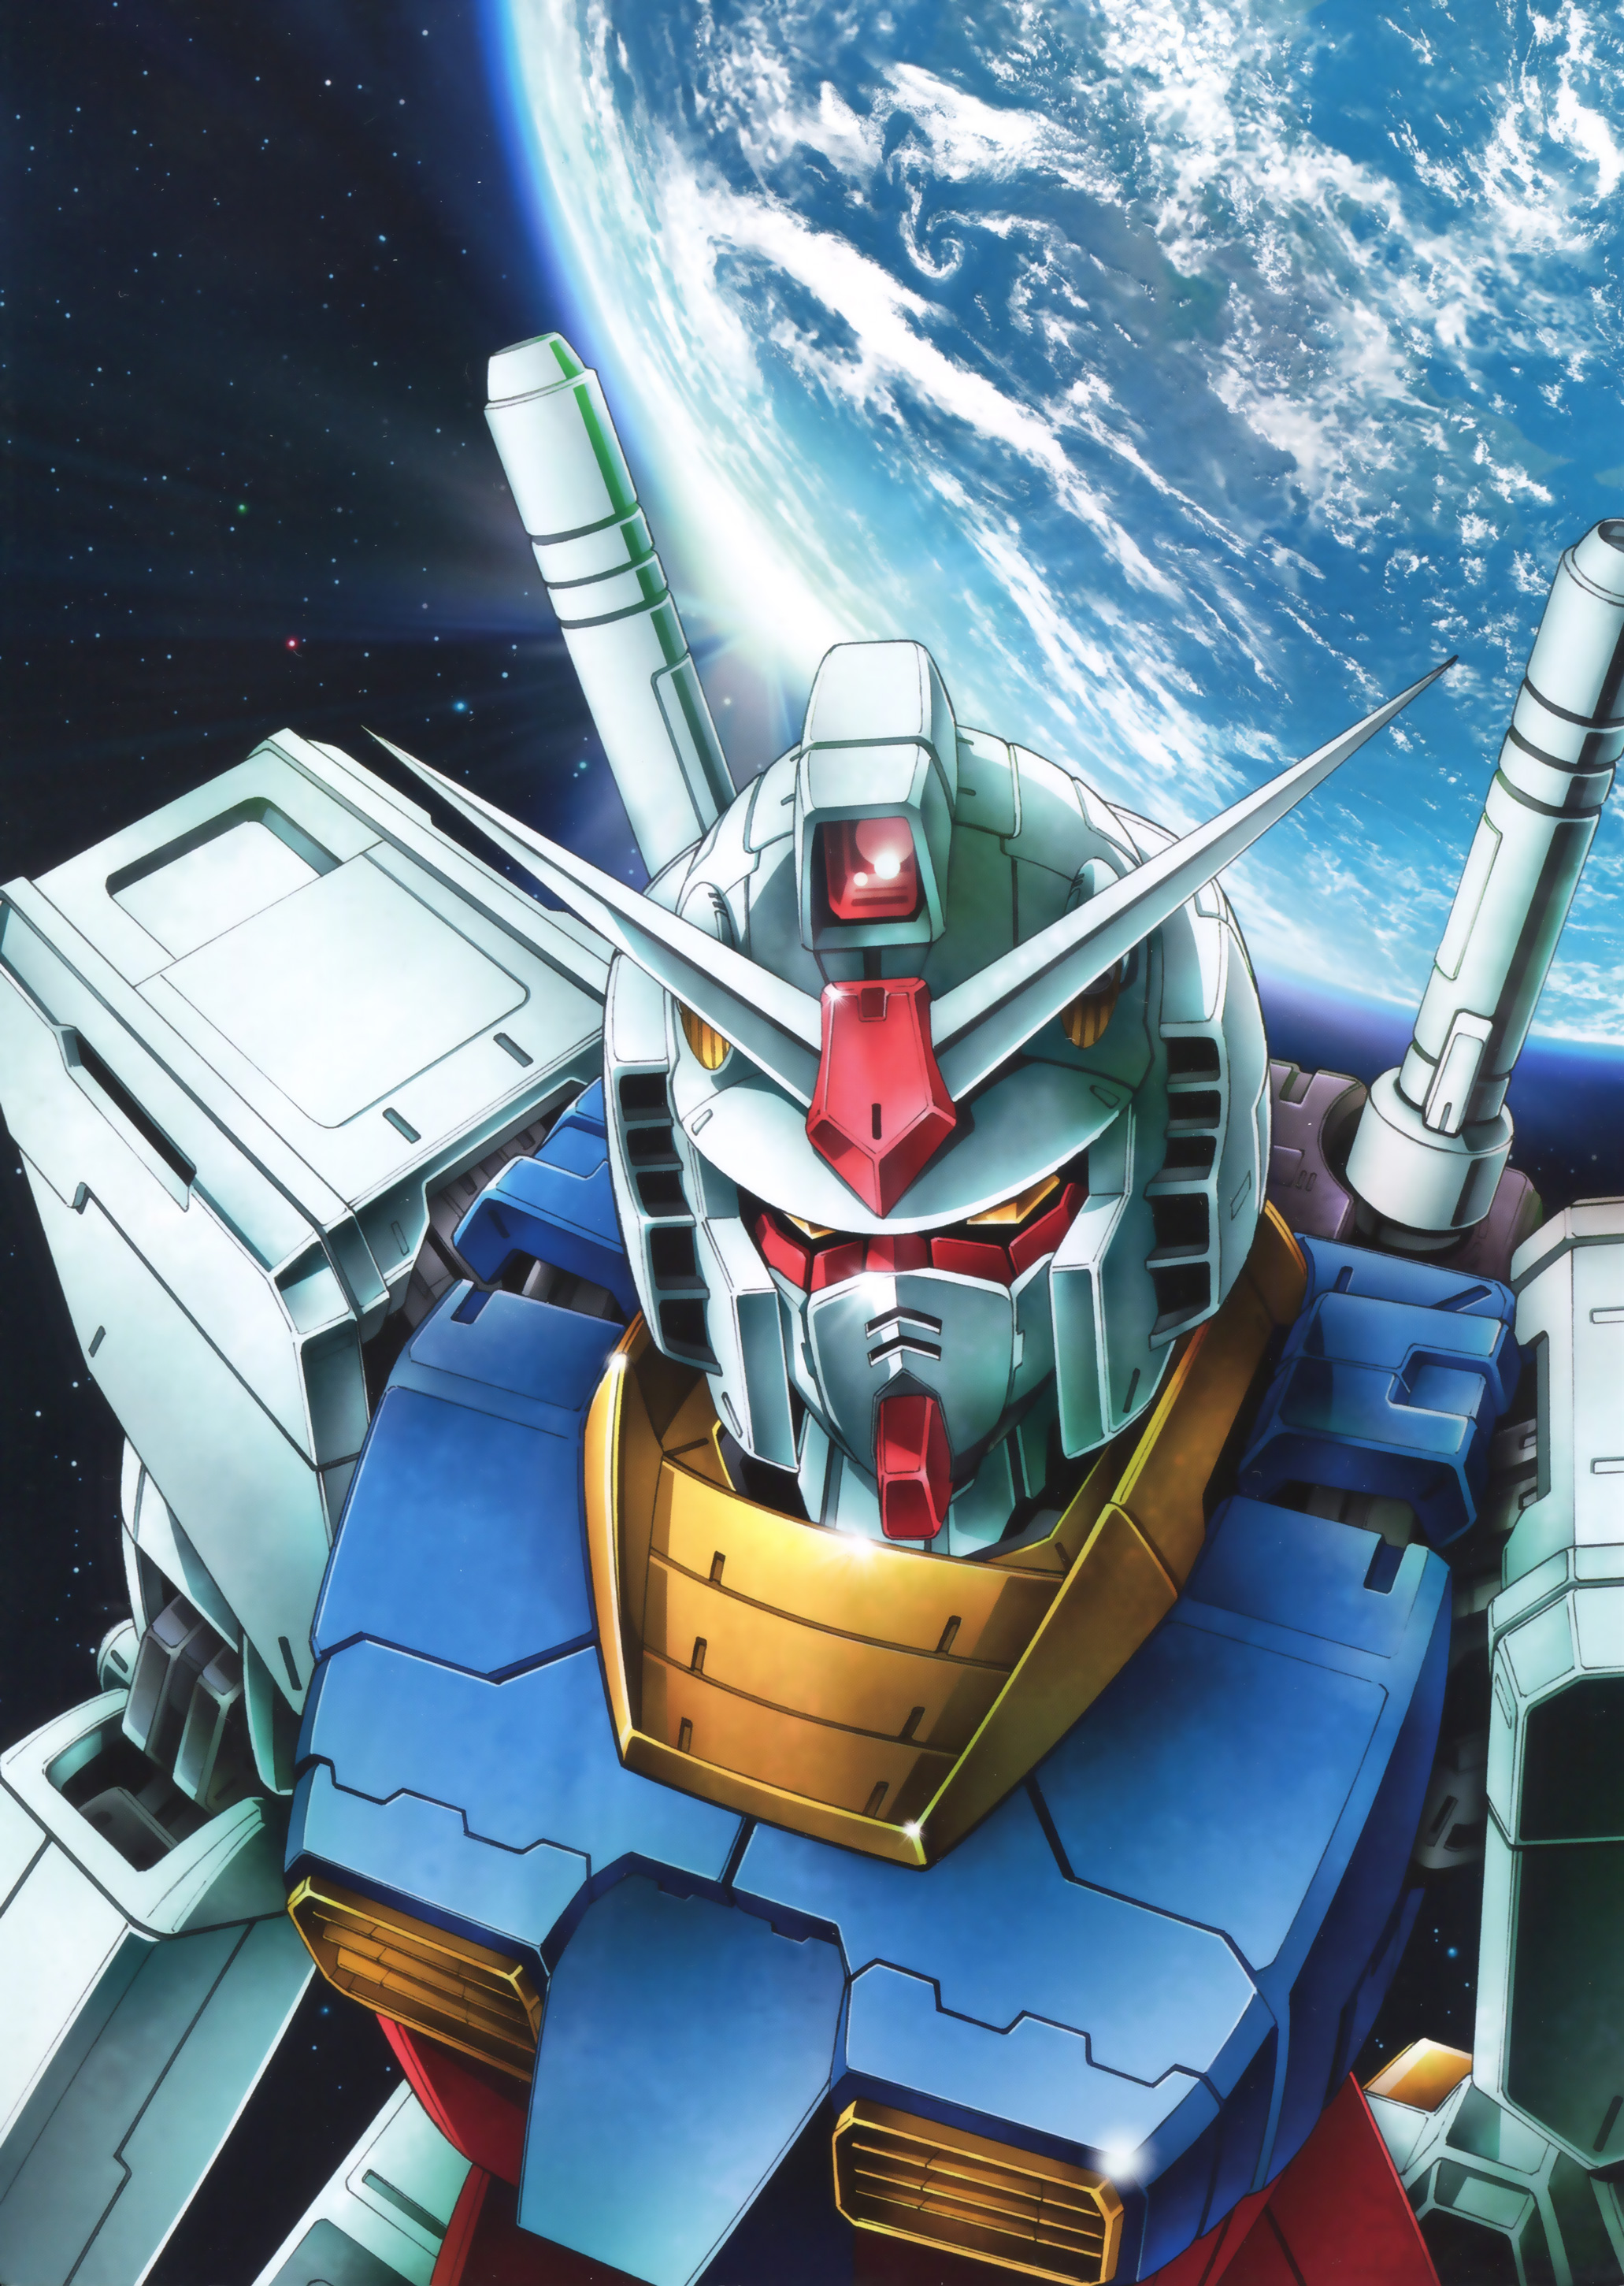 Rx 78 2 Gundam Mobile Suit Gundam Image 2485334 Zerochan